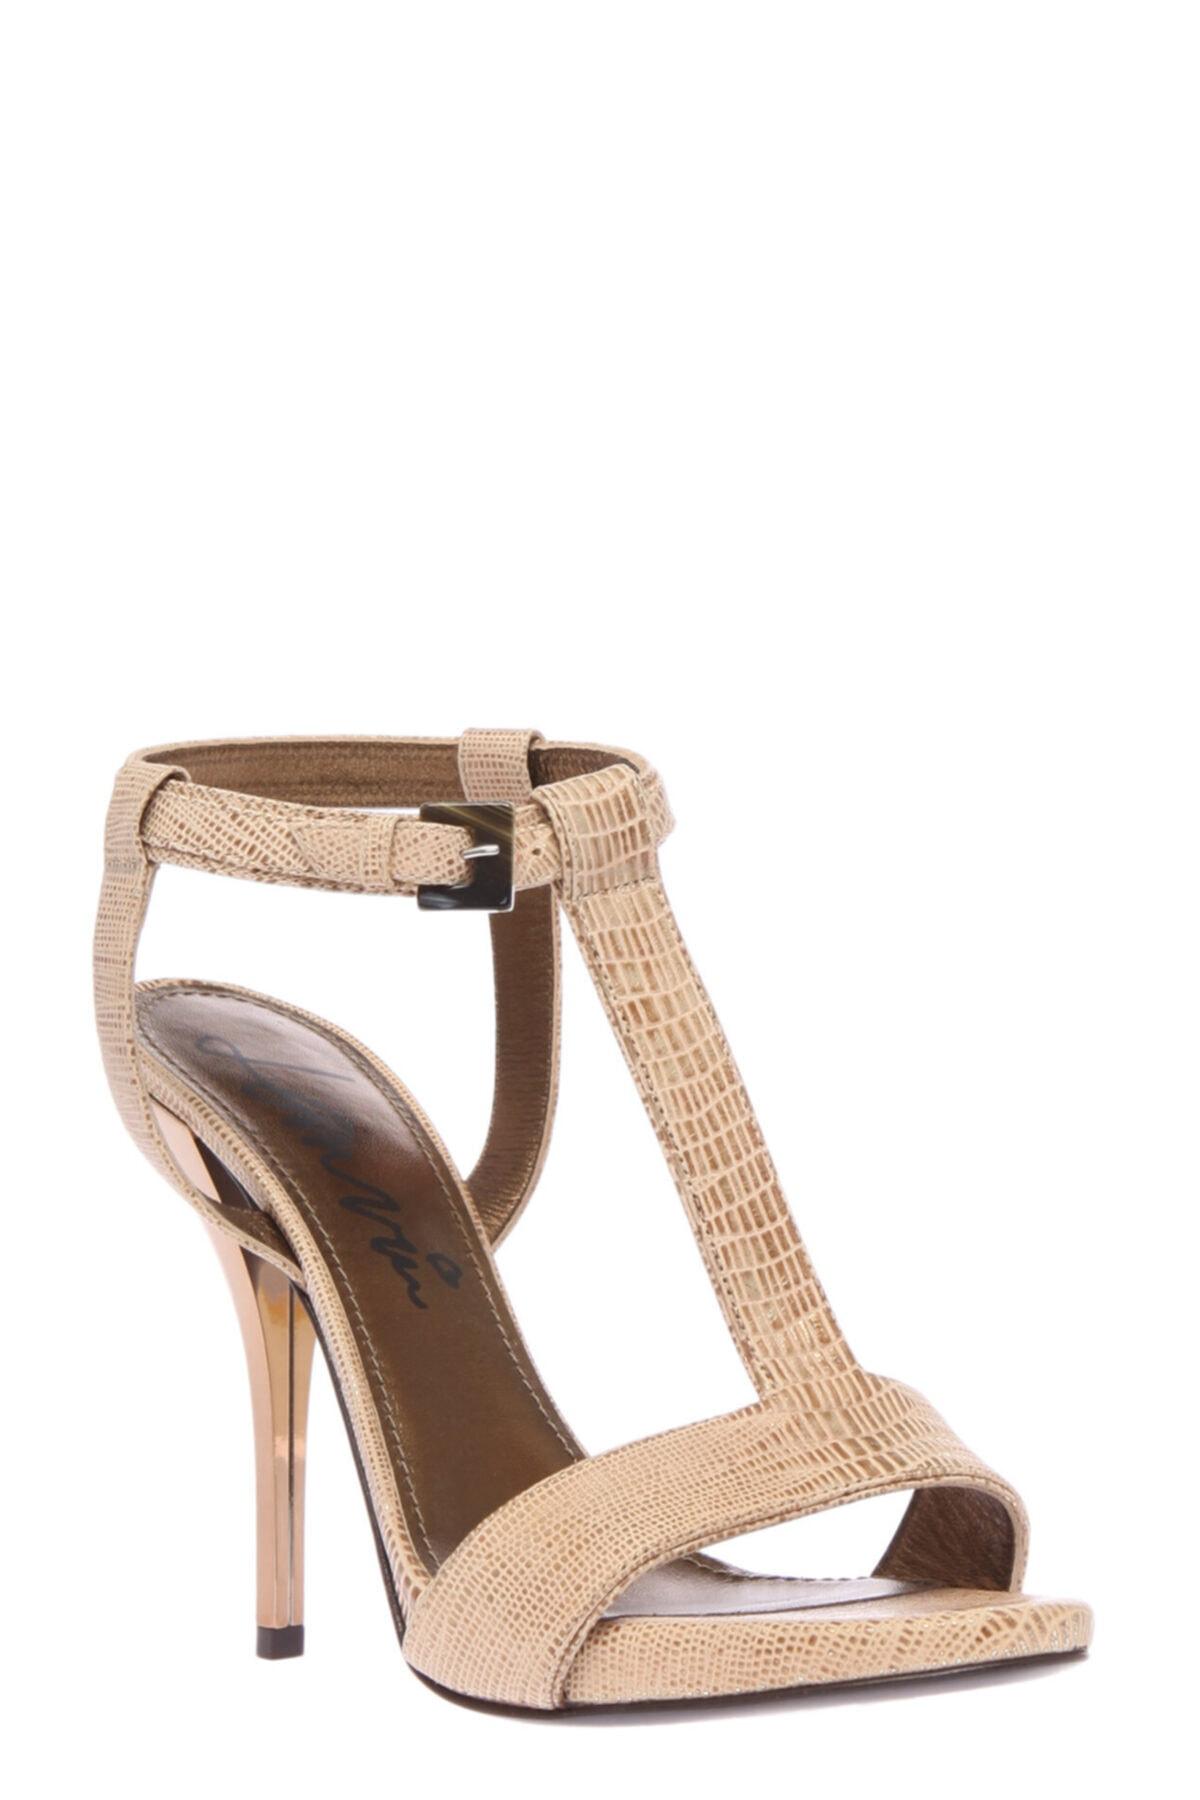 Lanvin Sandalet 2